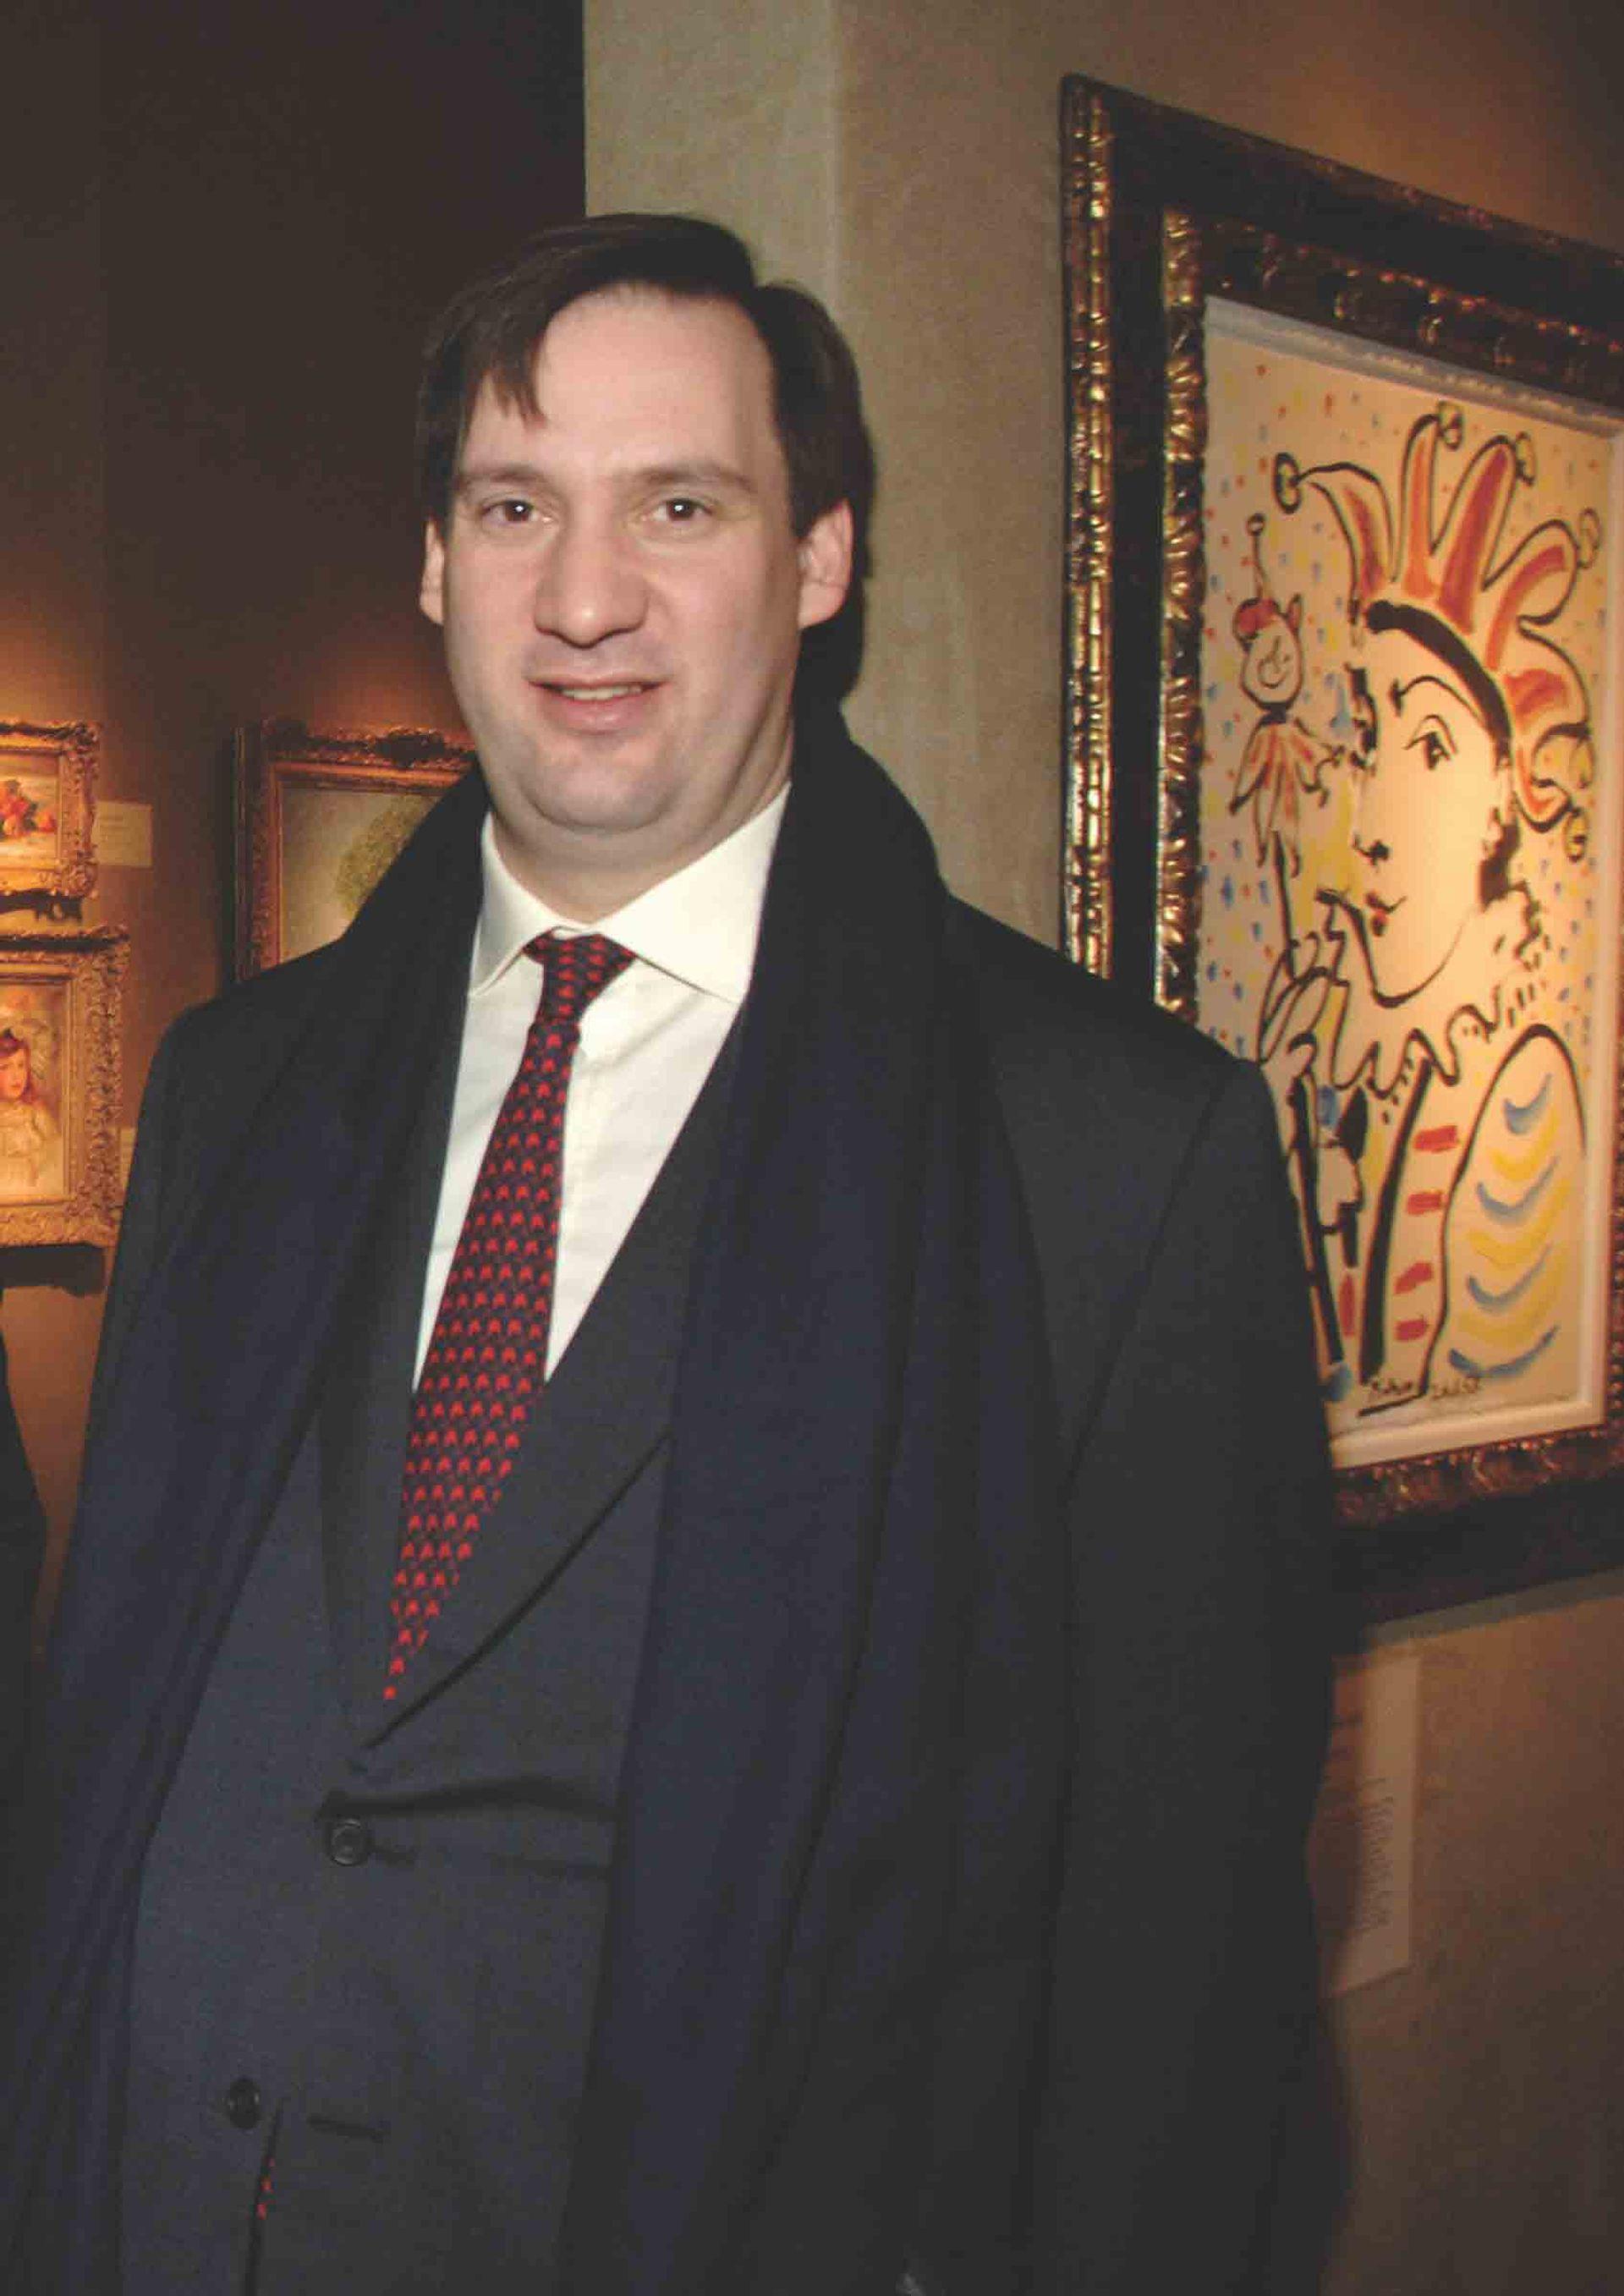 Matthew Green, Owner of Mayfair Fine Art Limited. © Patrick McMullan